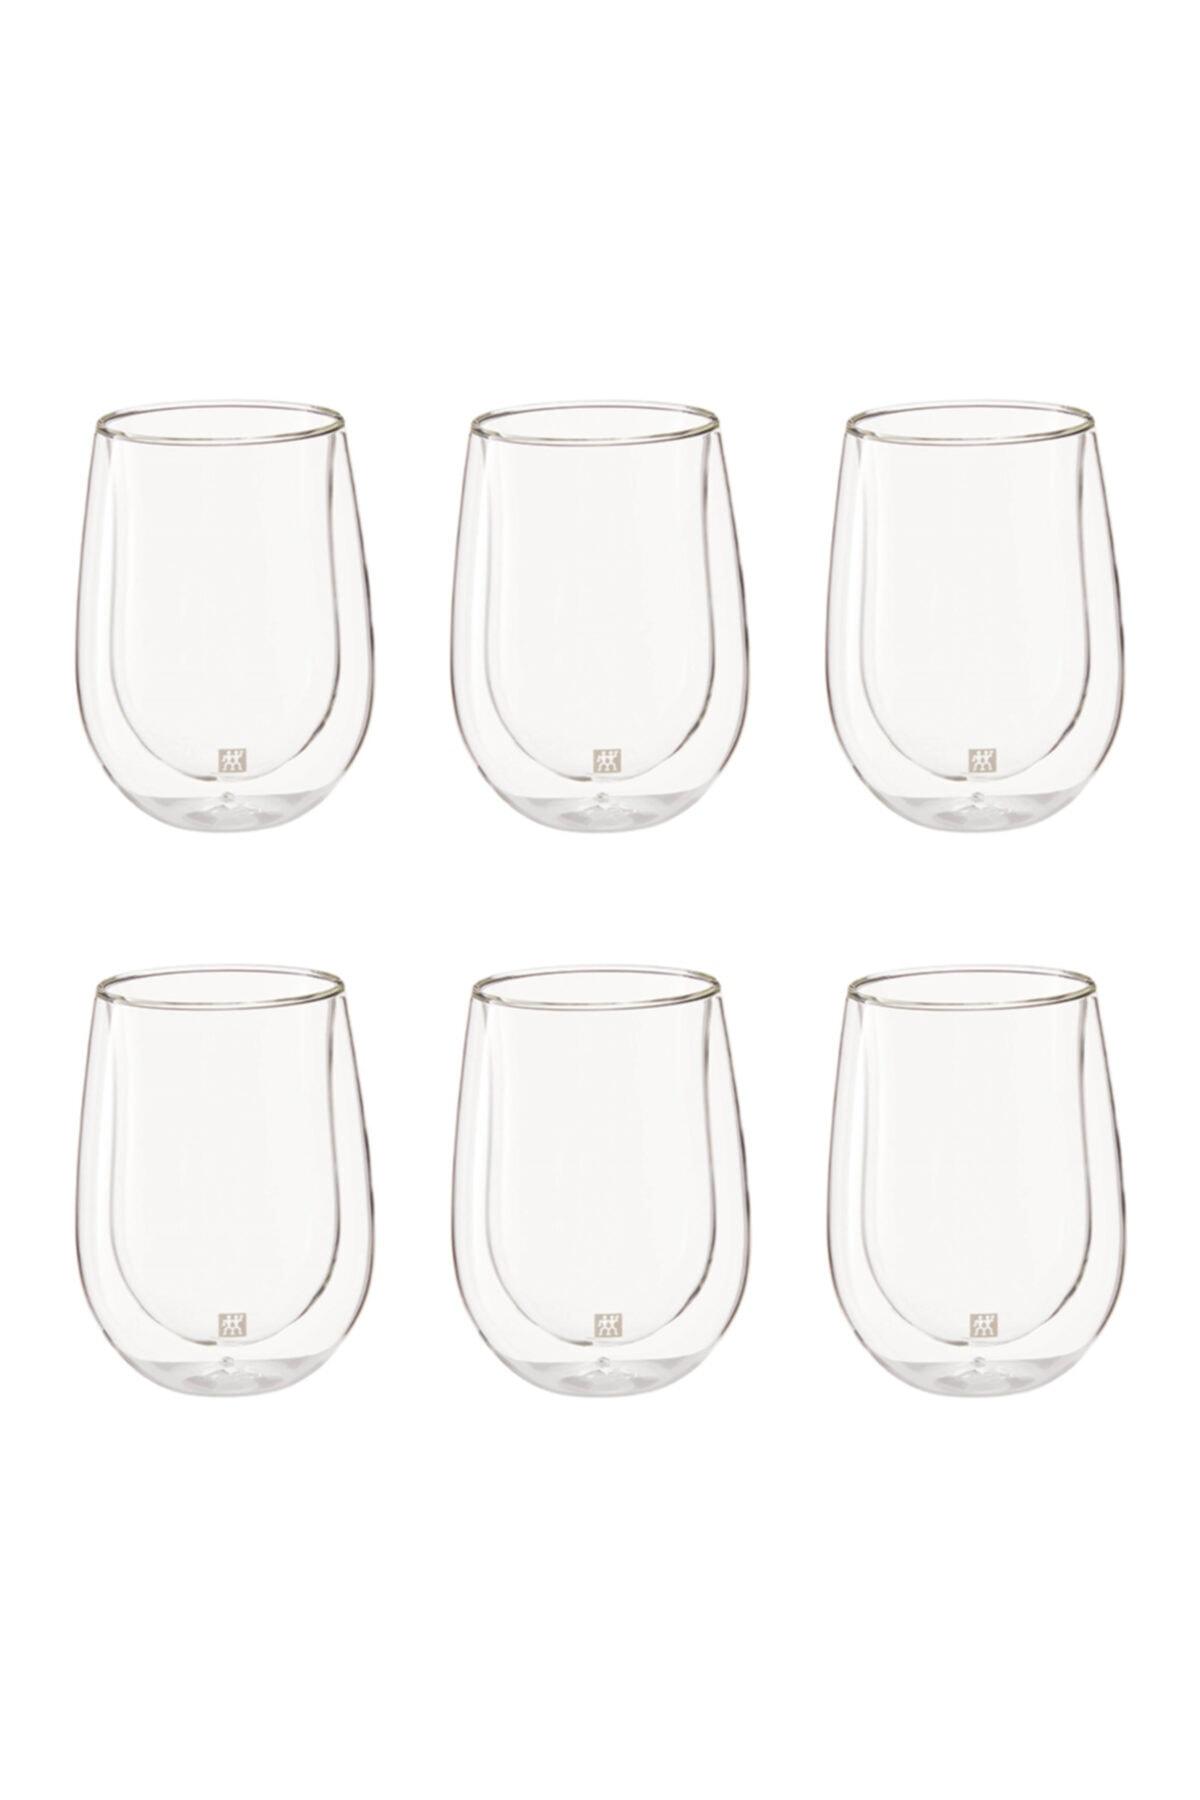 ZWILLING Çift Camlı 6'lı Beyaz Meşrubat Bardağı Seti 1